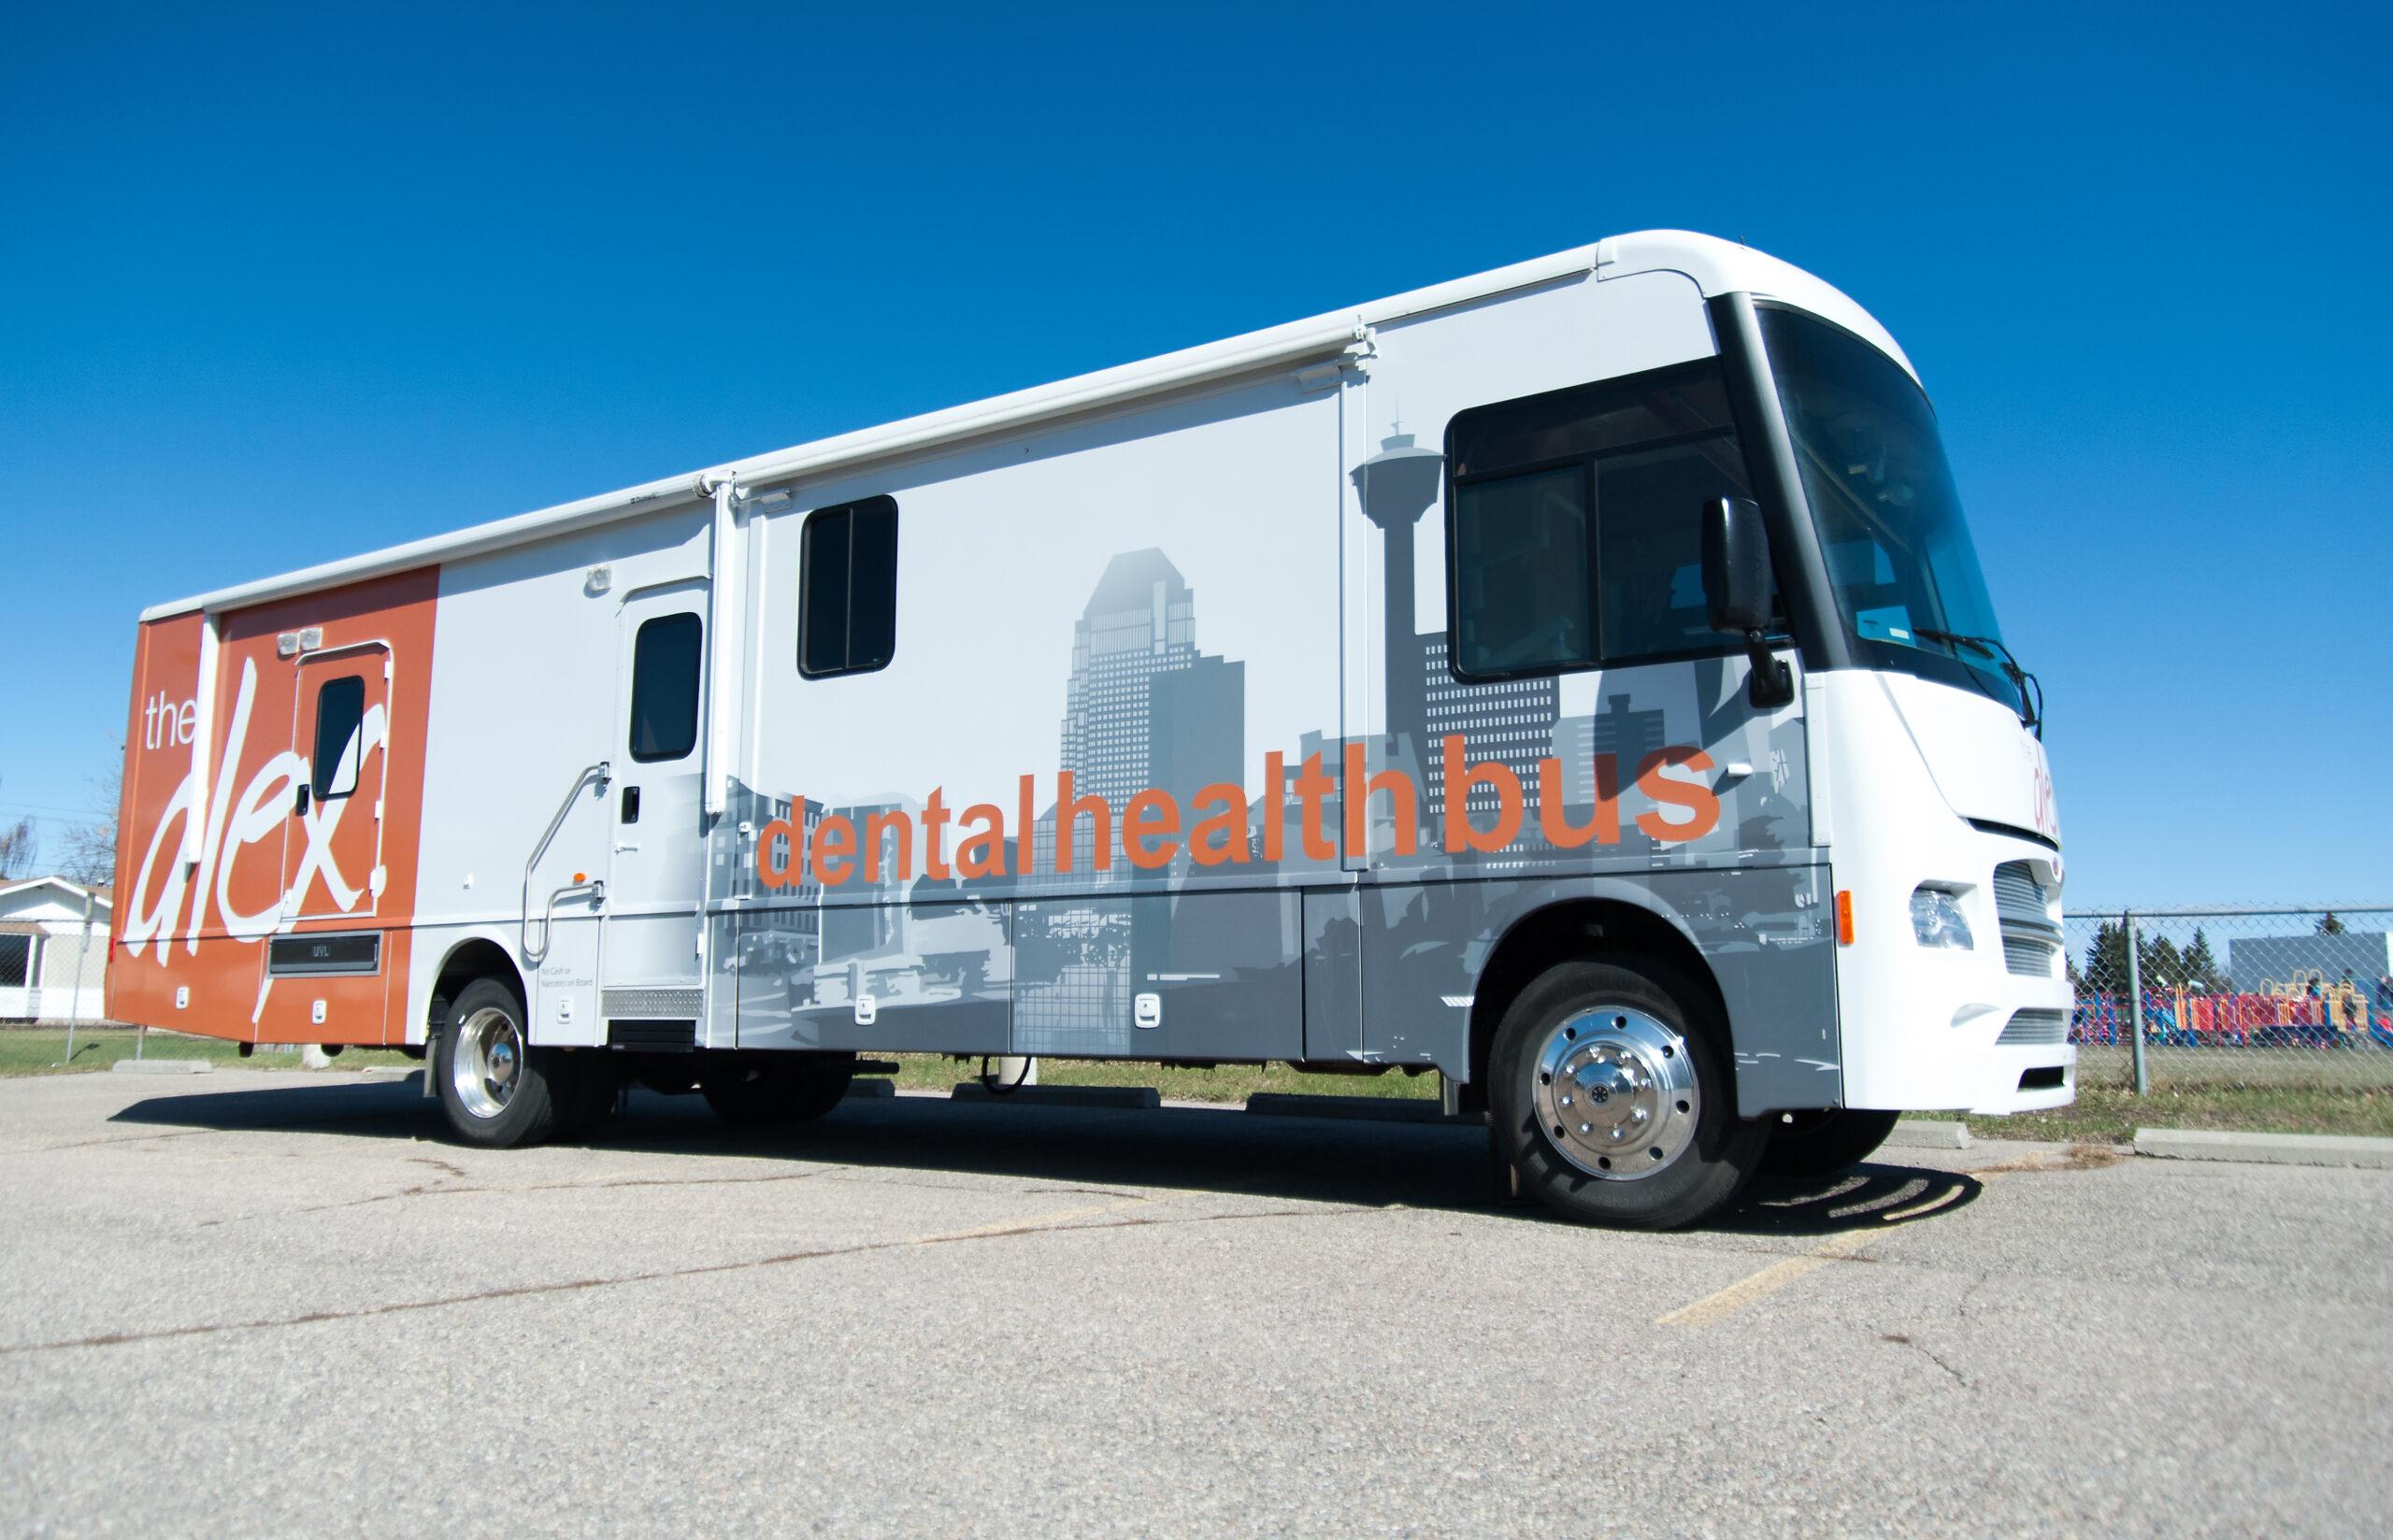 A side-profile photo of The Alex Dental Health Bus